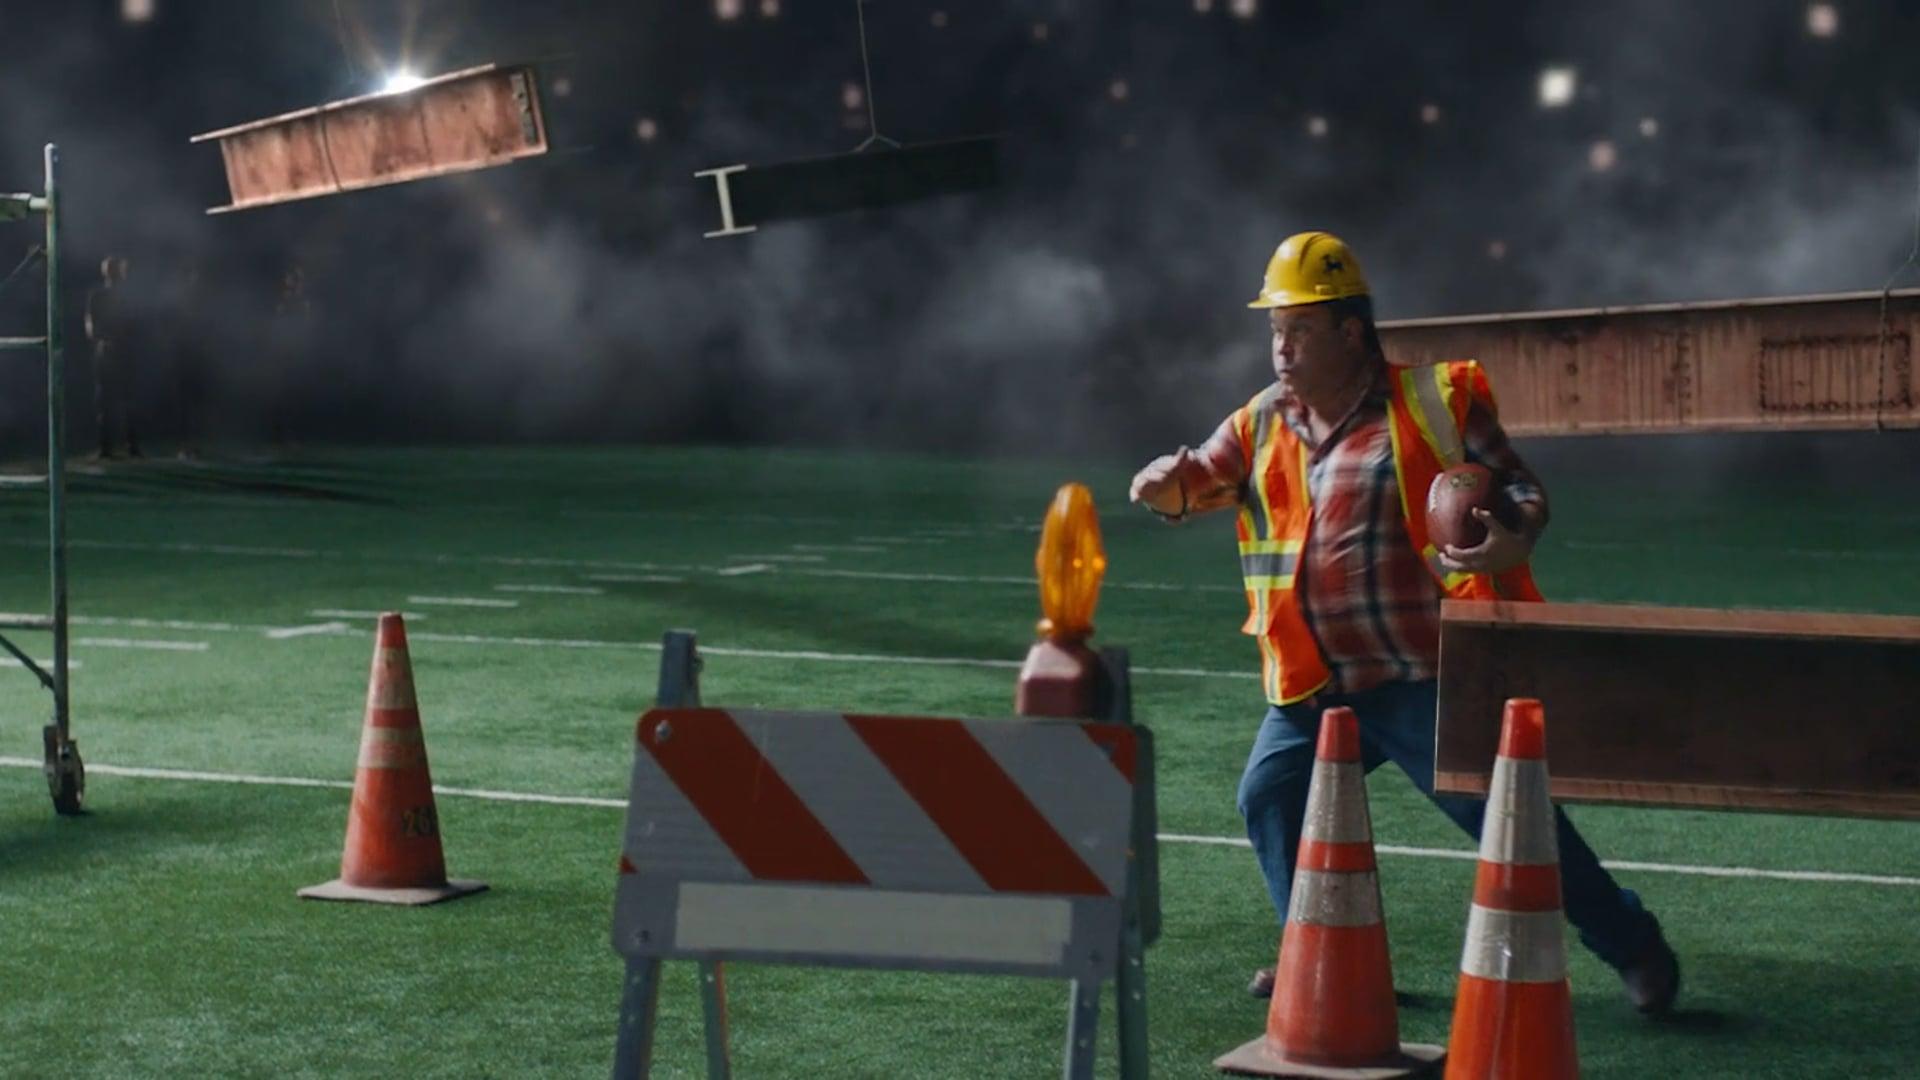 Monday Night Football - Construction Worker.mp4